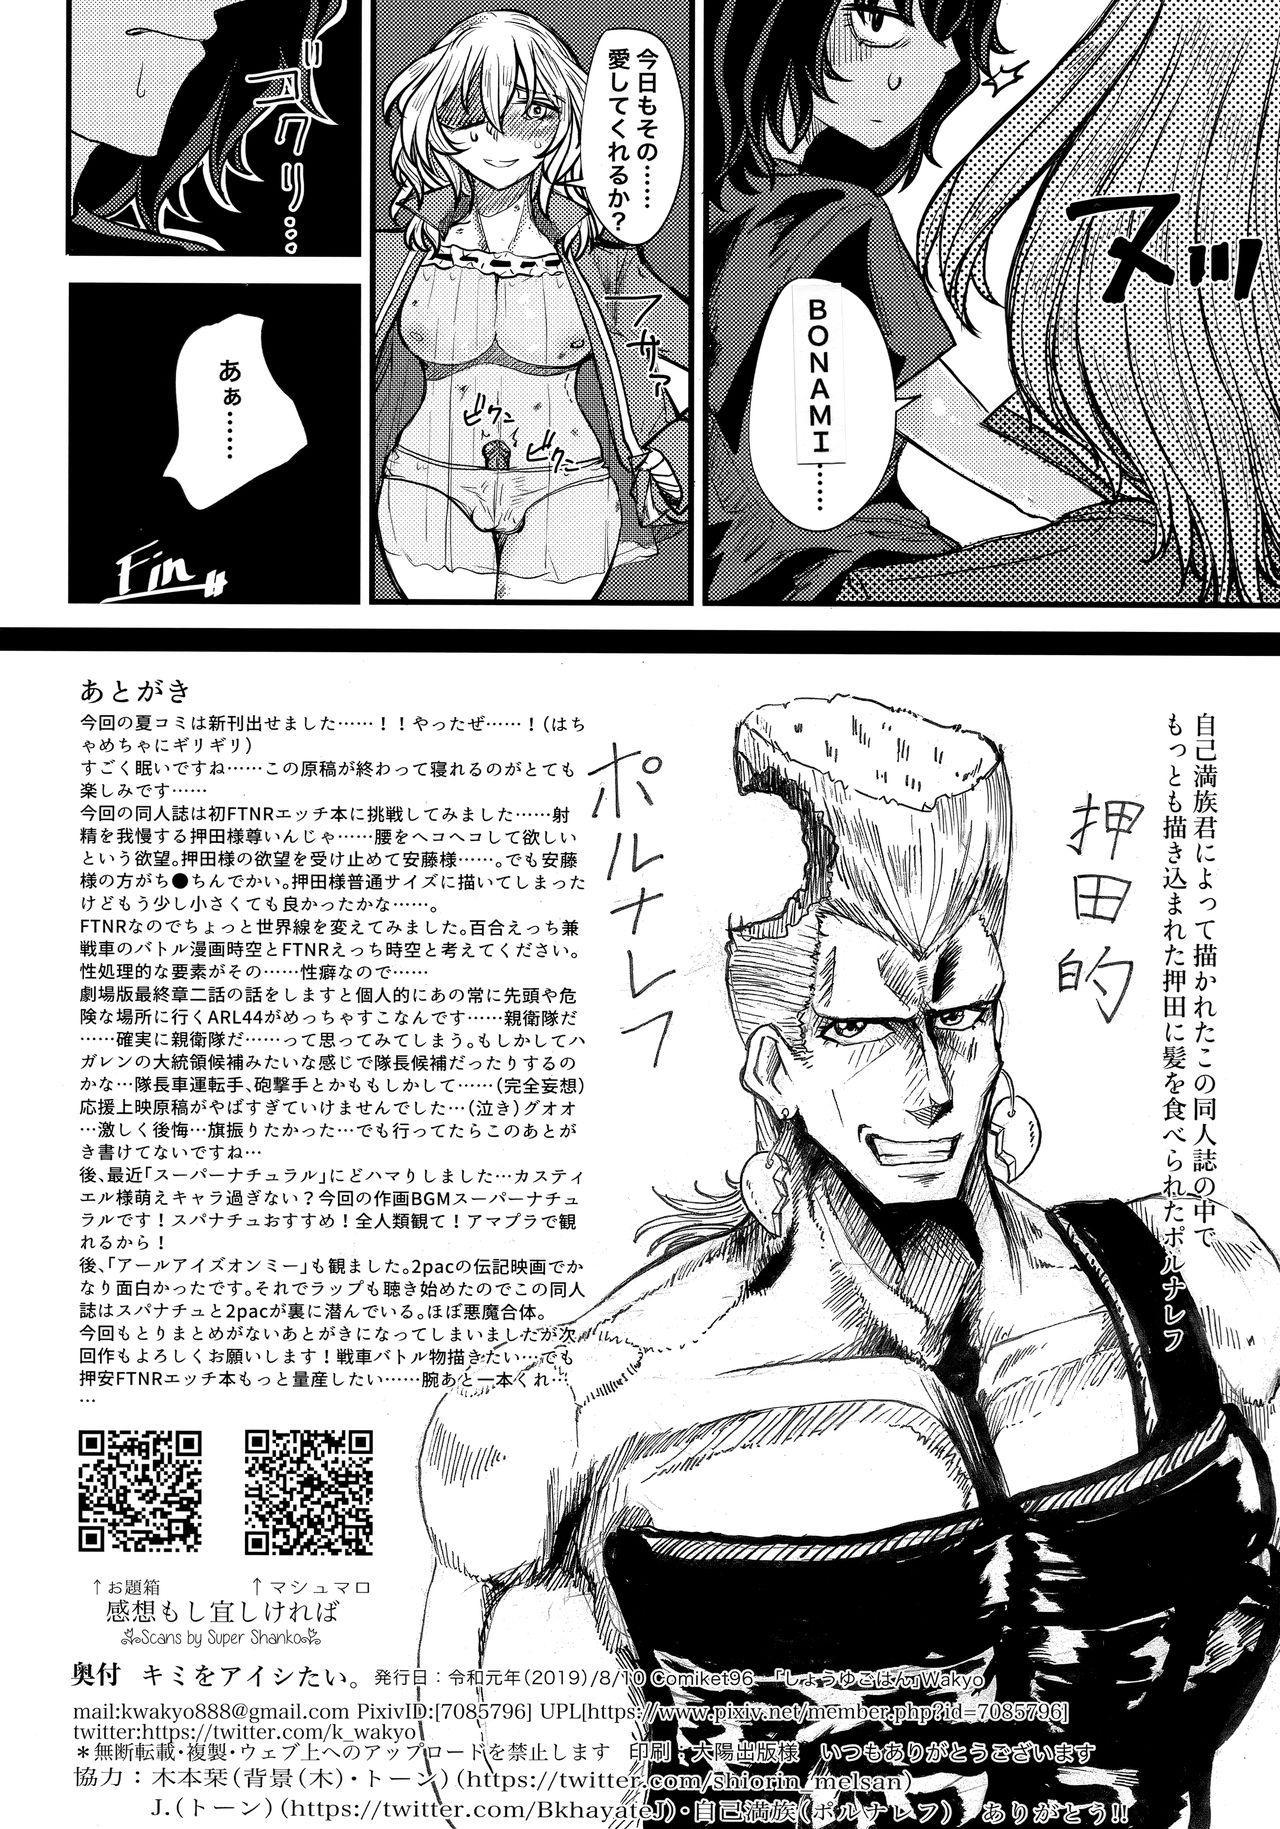 Kimi o Aishitai. 24